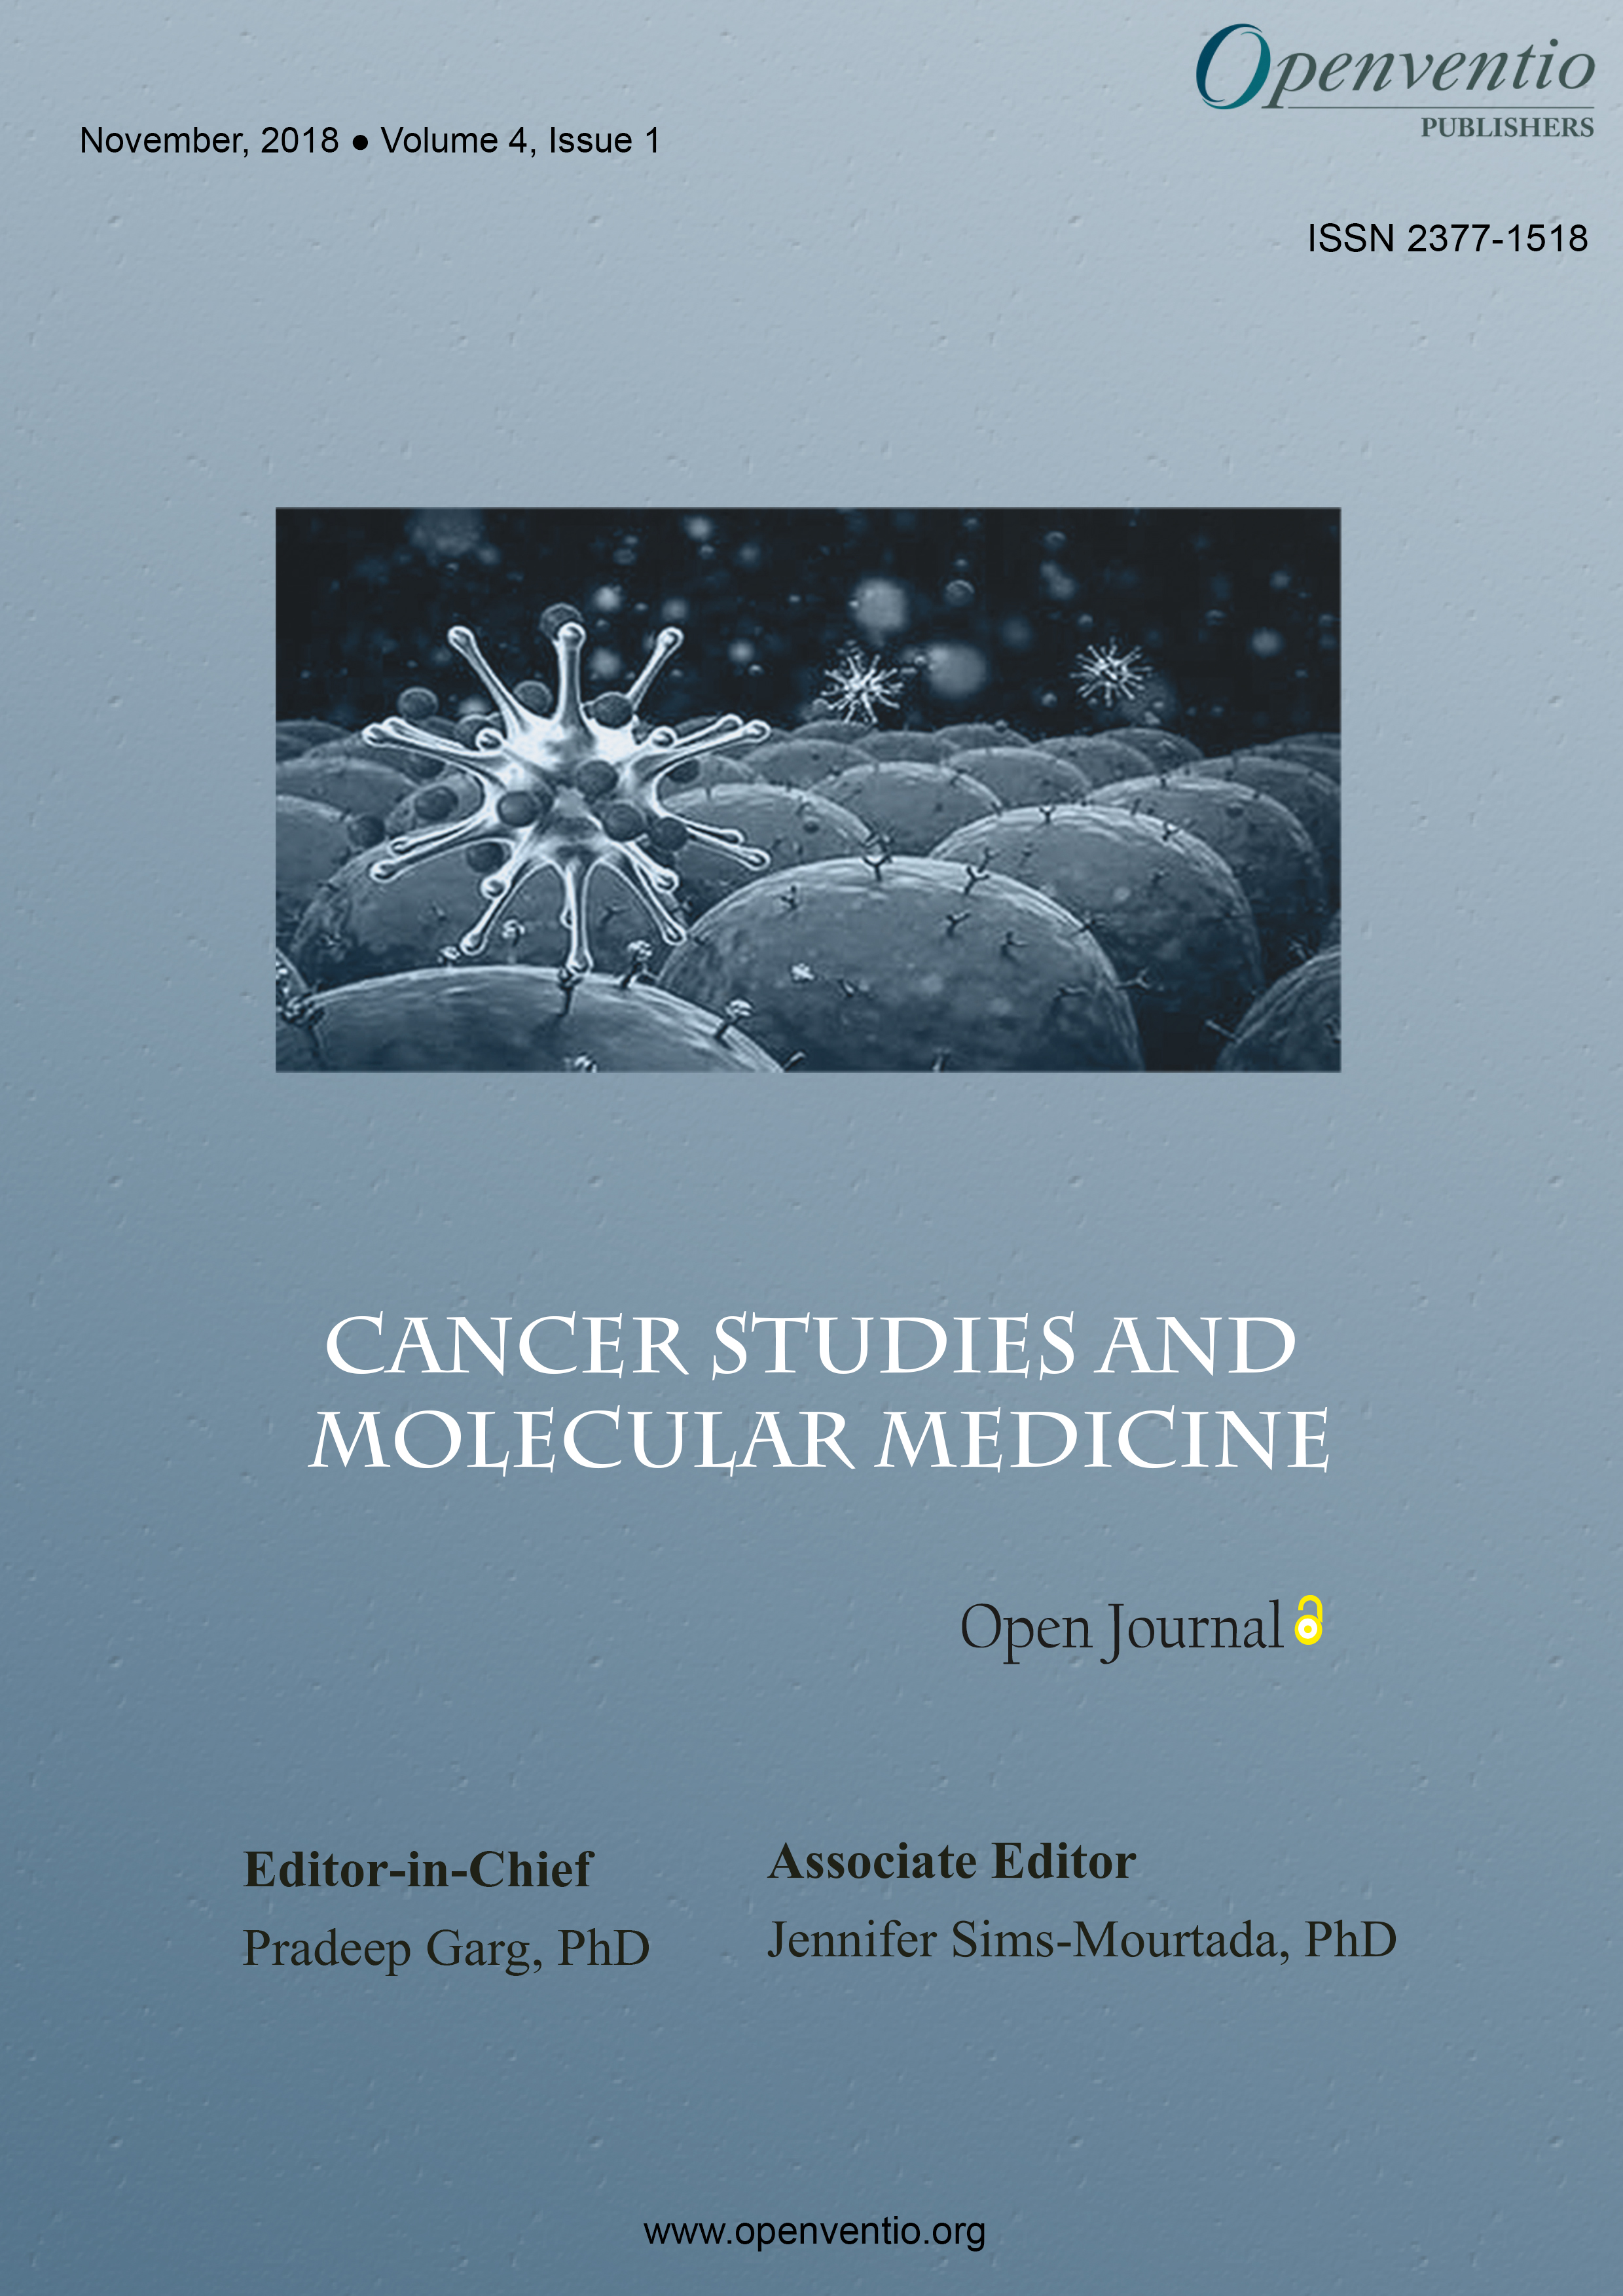 Cancer Studies and Molecular Medicine – Open Journal (CSMMOJ